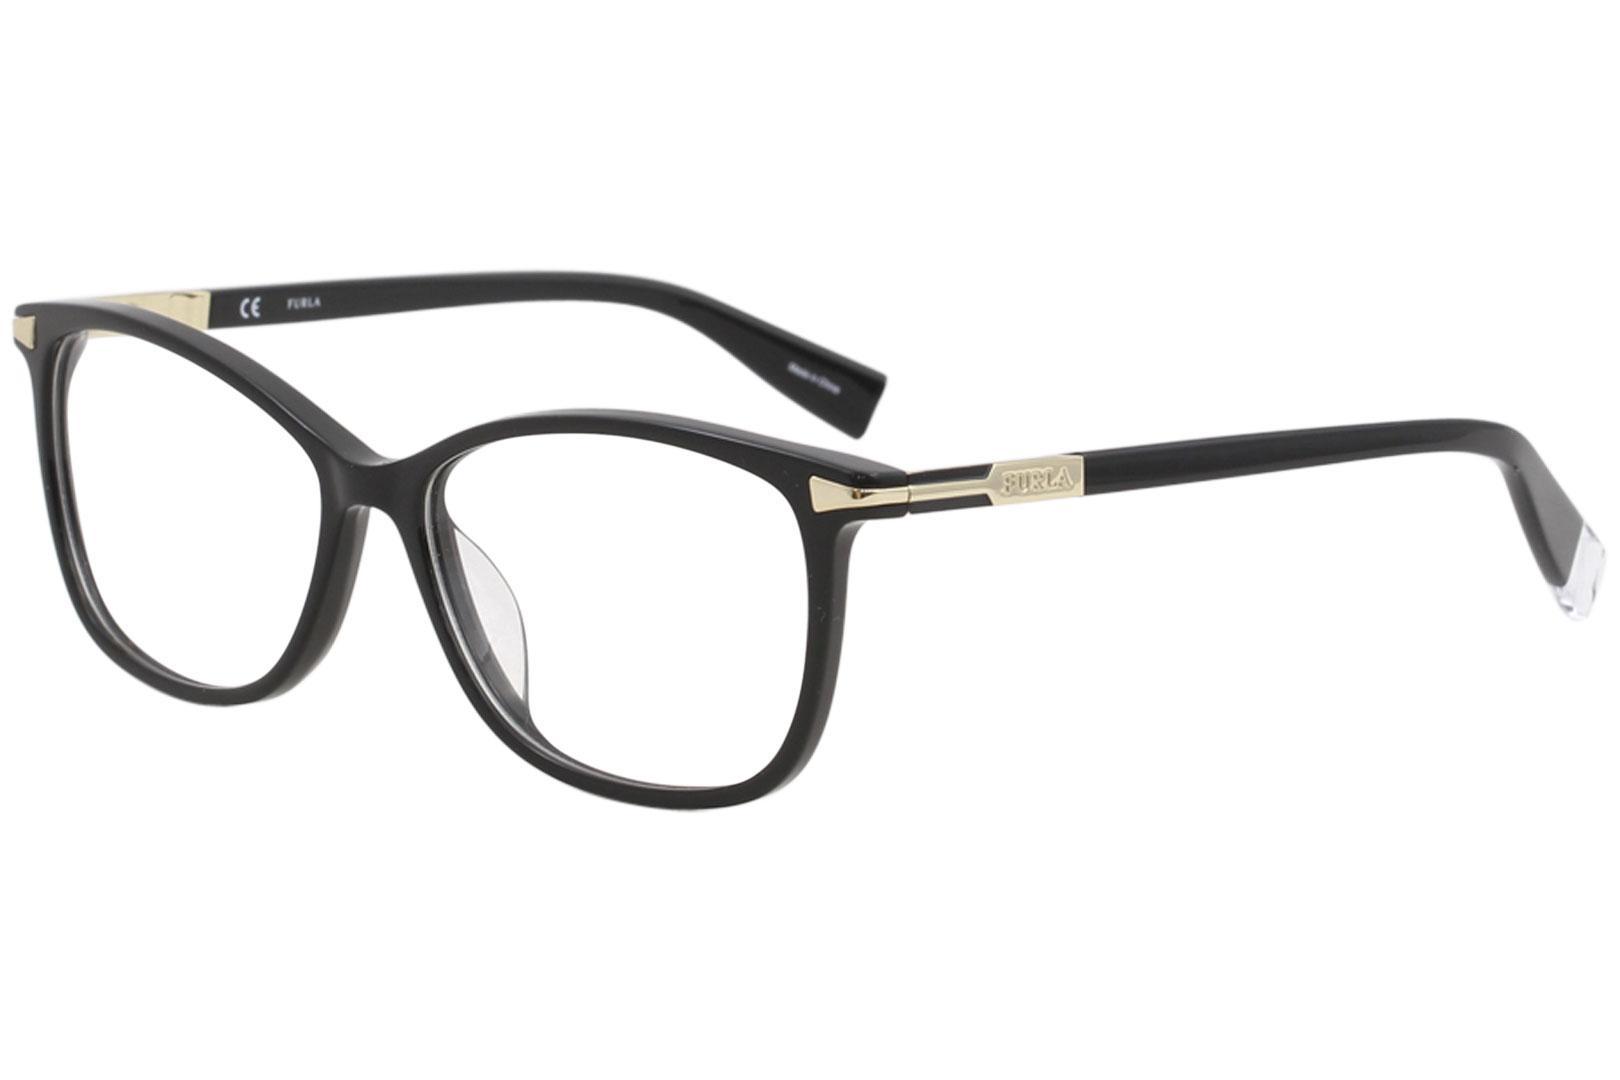 Image of Furla Women's Eyeglasses VFU026 VFU/026 700Y Black Full Rim Optical Frame 54mm - Black   700Y - Lens 54 Bridge 15 B 40 ED 58 Temple 135mm